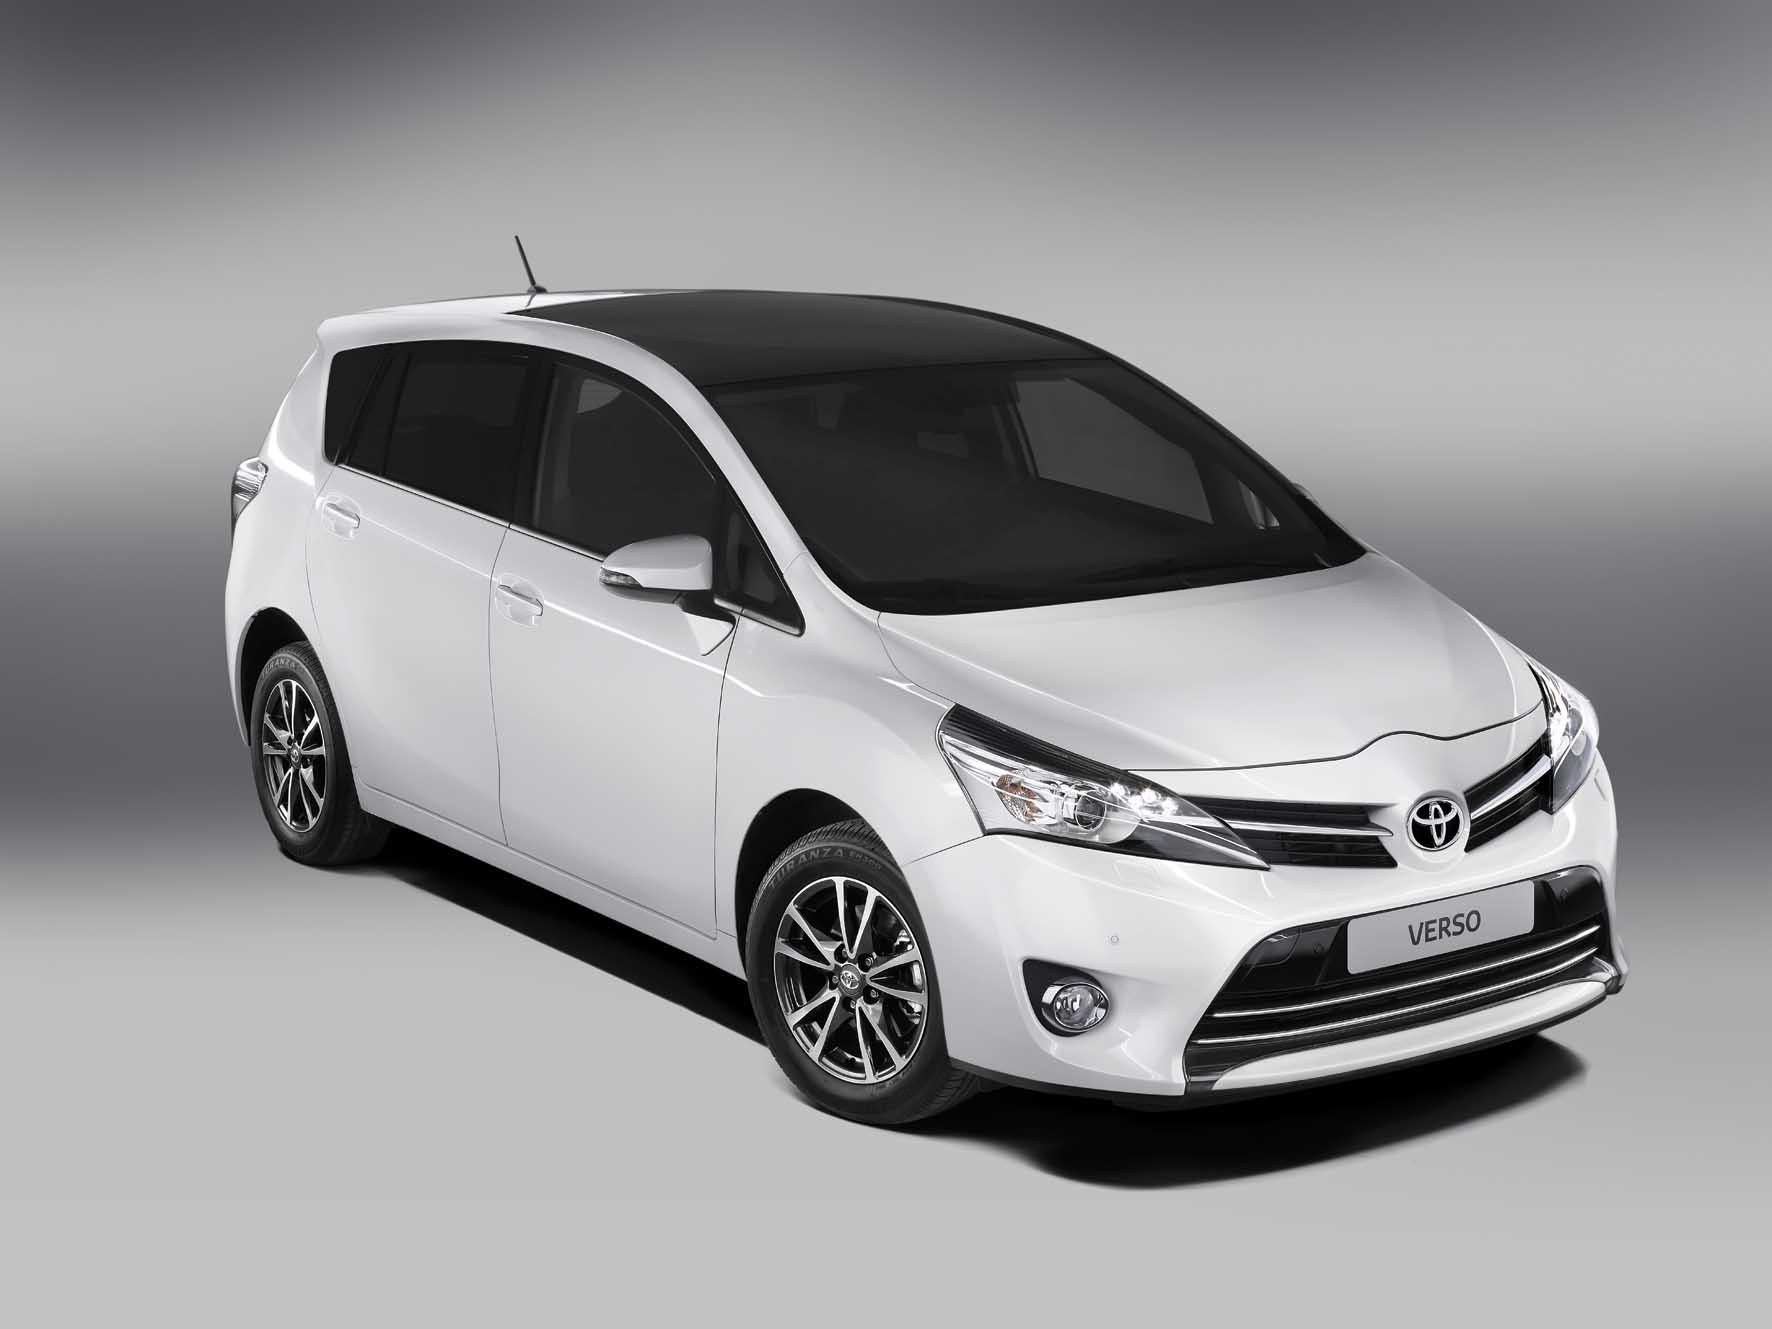 Toyota 2012 nuova Verso frontlat 1